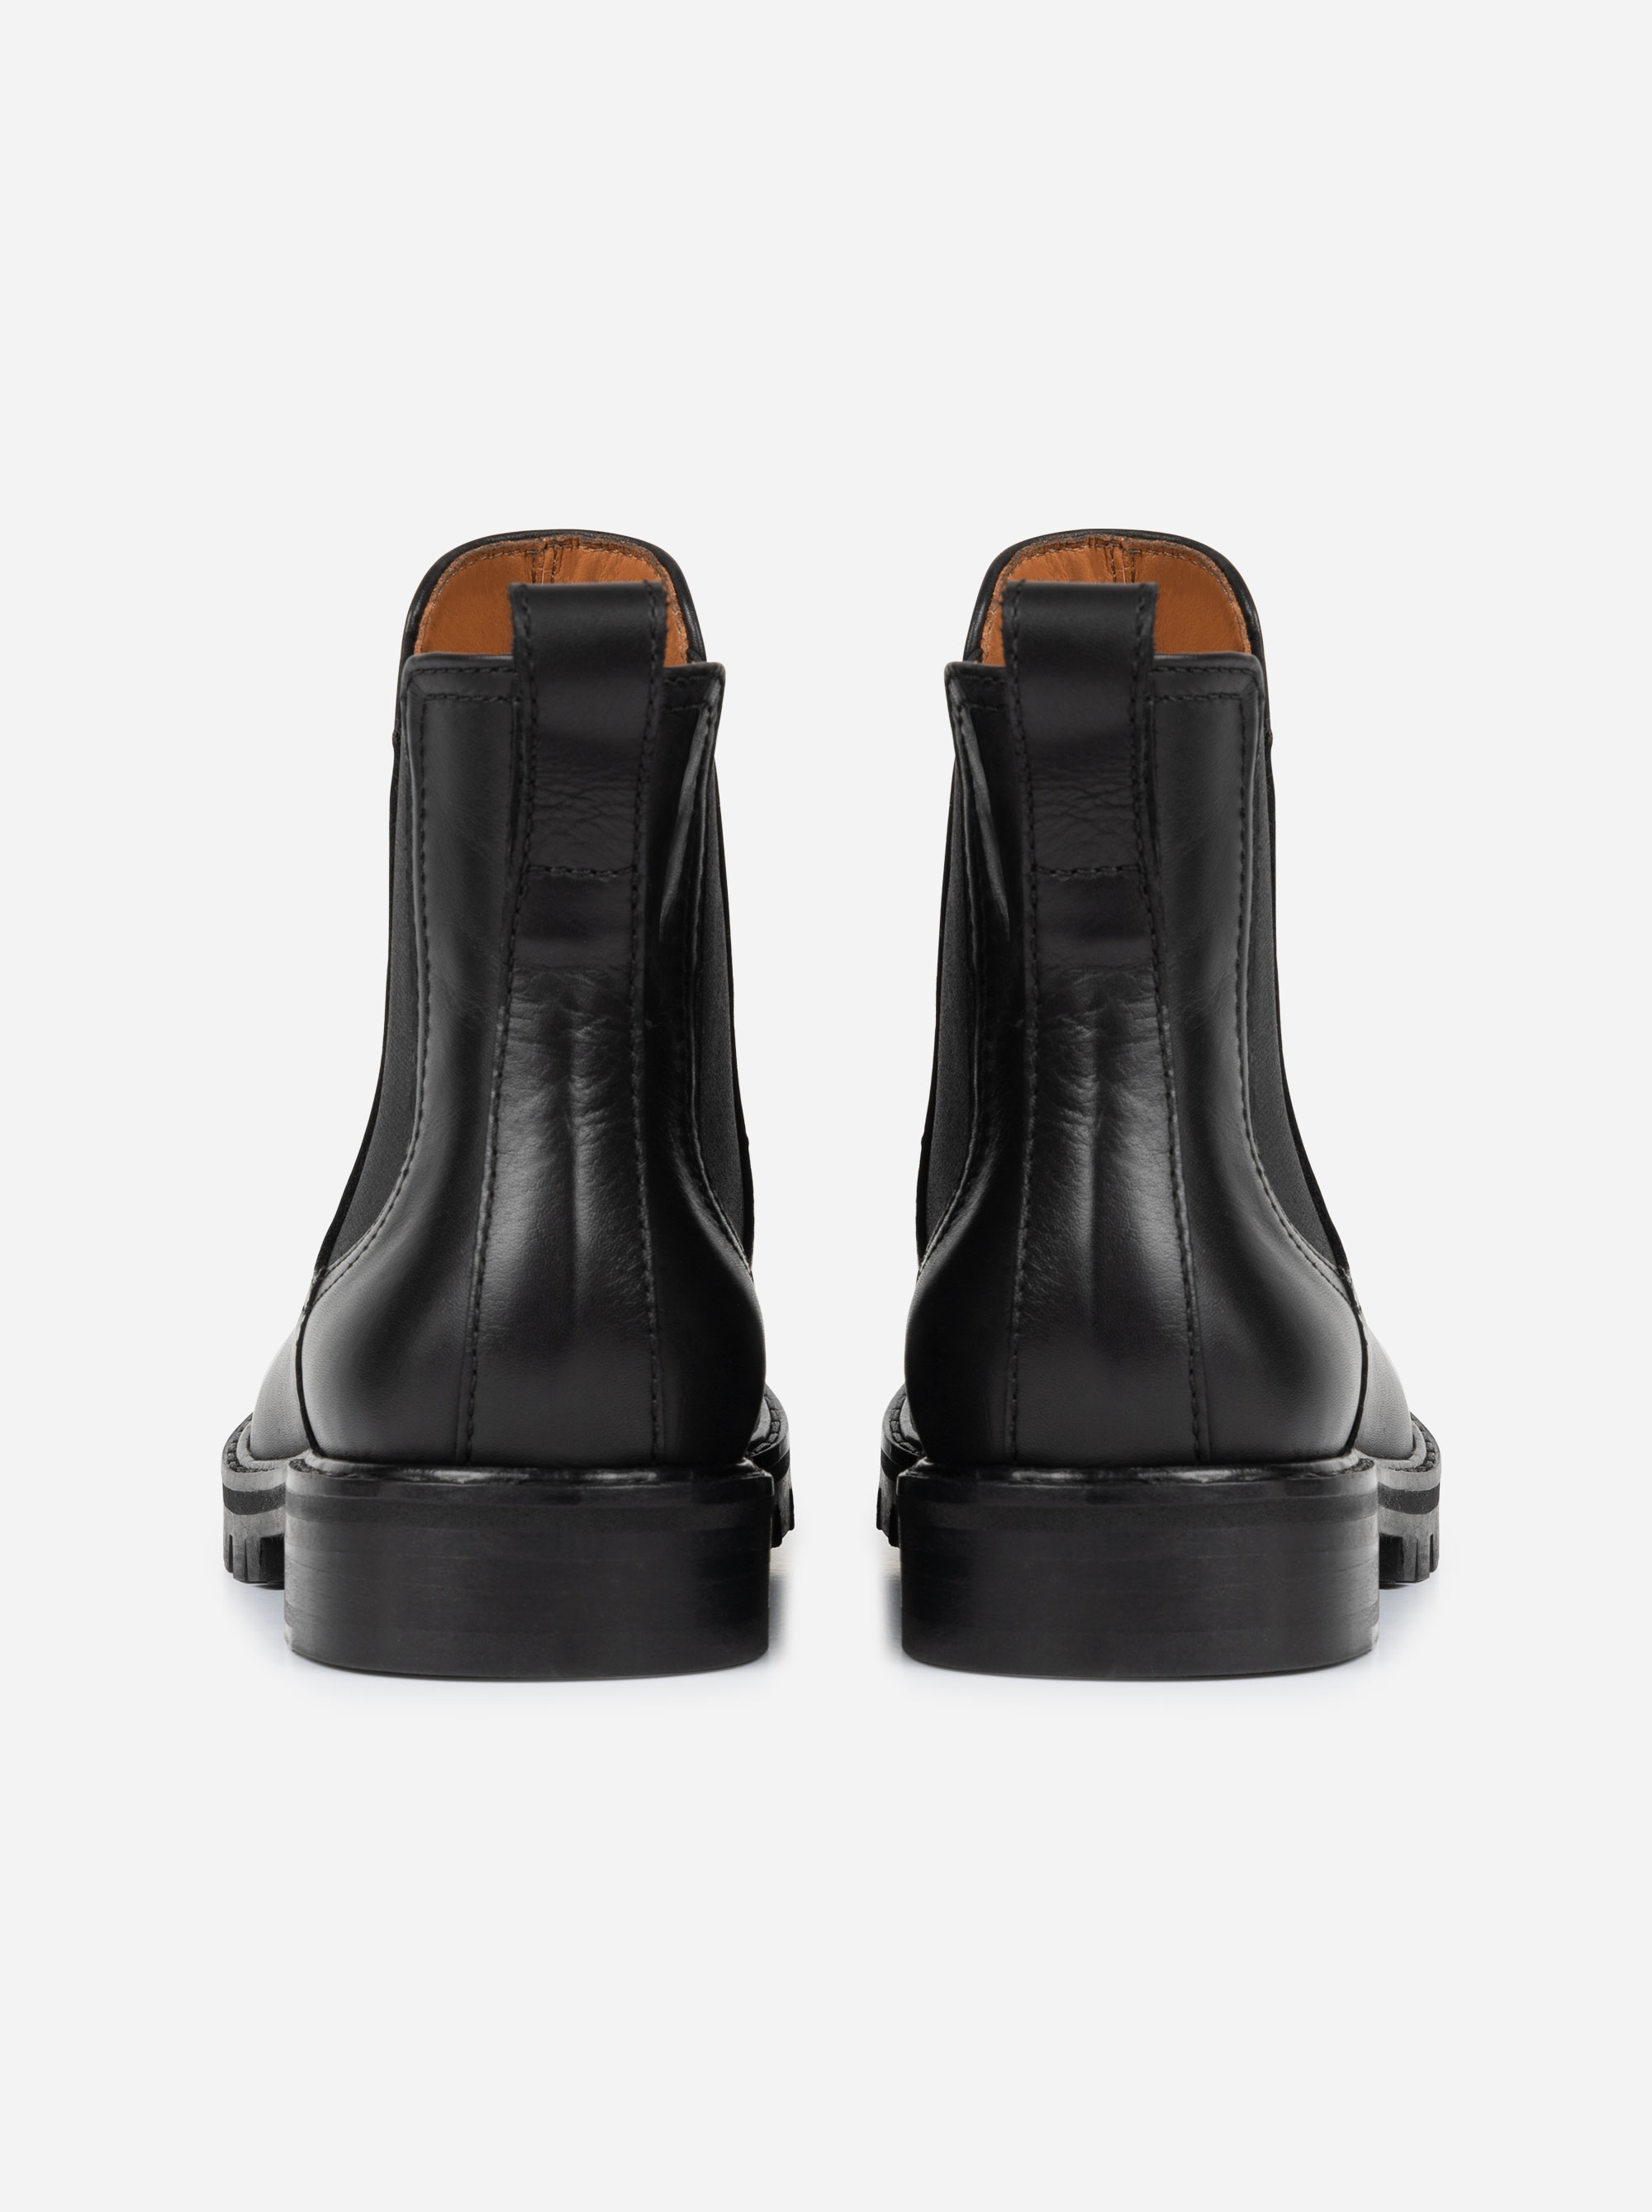 Teym - The Chelsea Boot - Black - 5